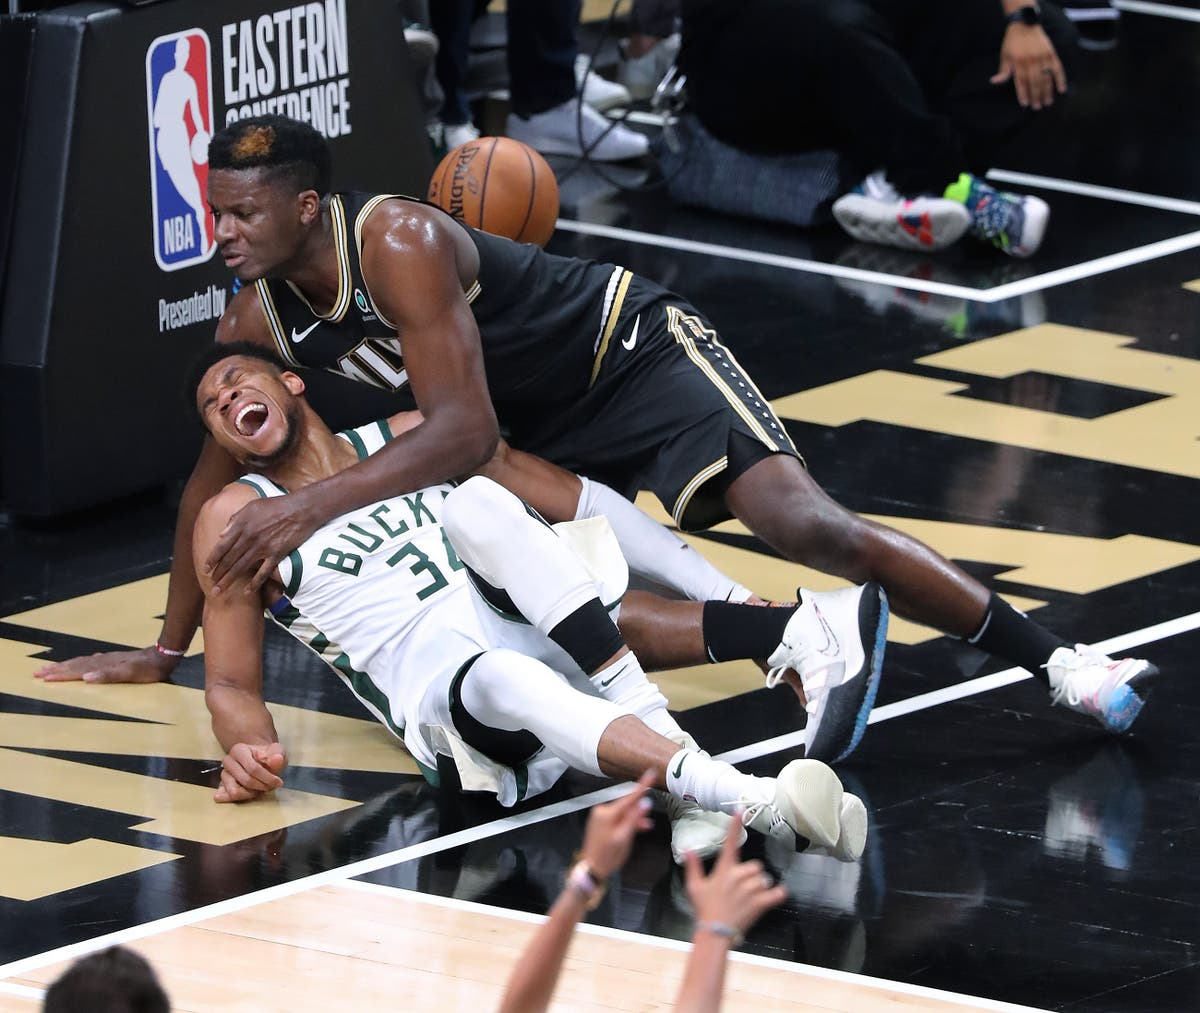 Giannis Antetokounmpo injury caps grim night for Milwaukee Bucks